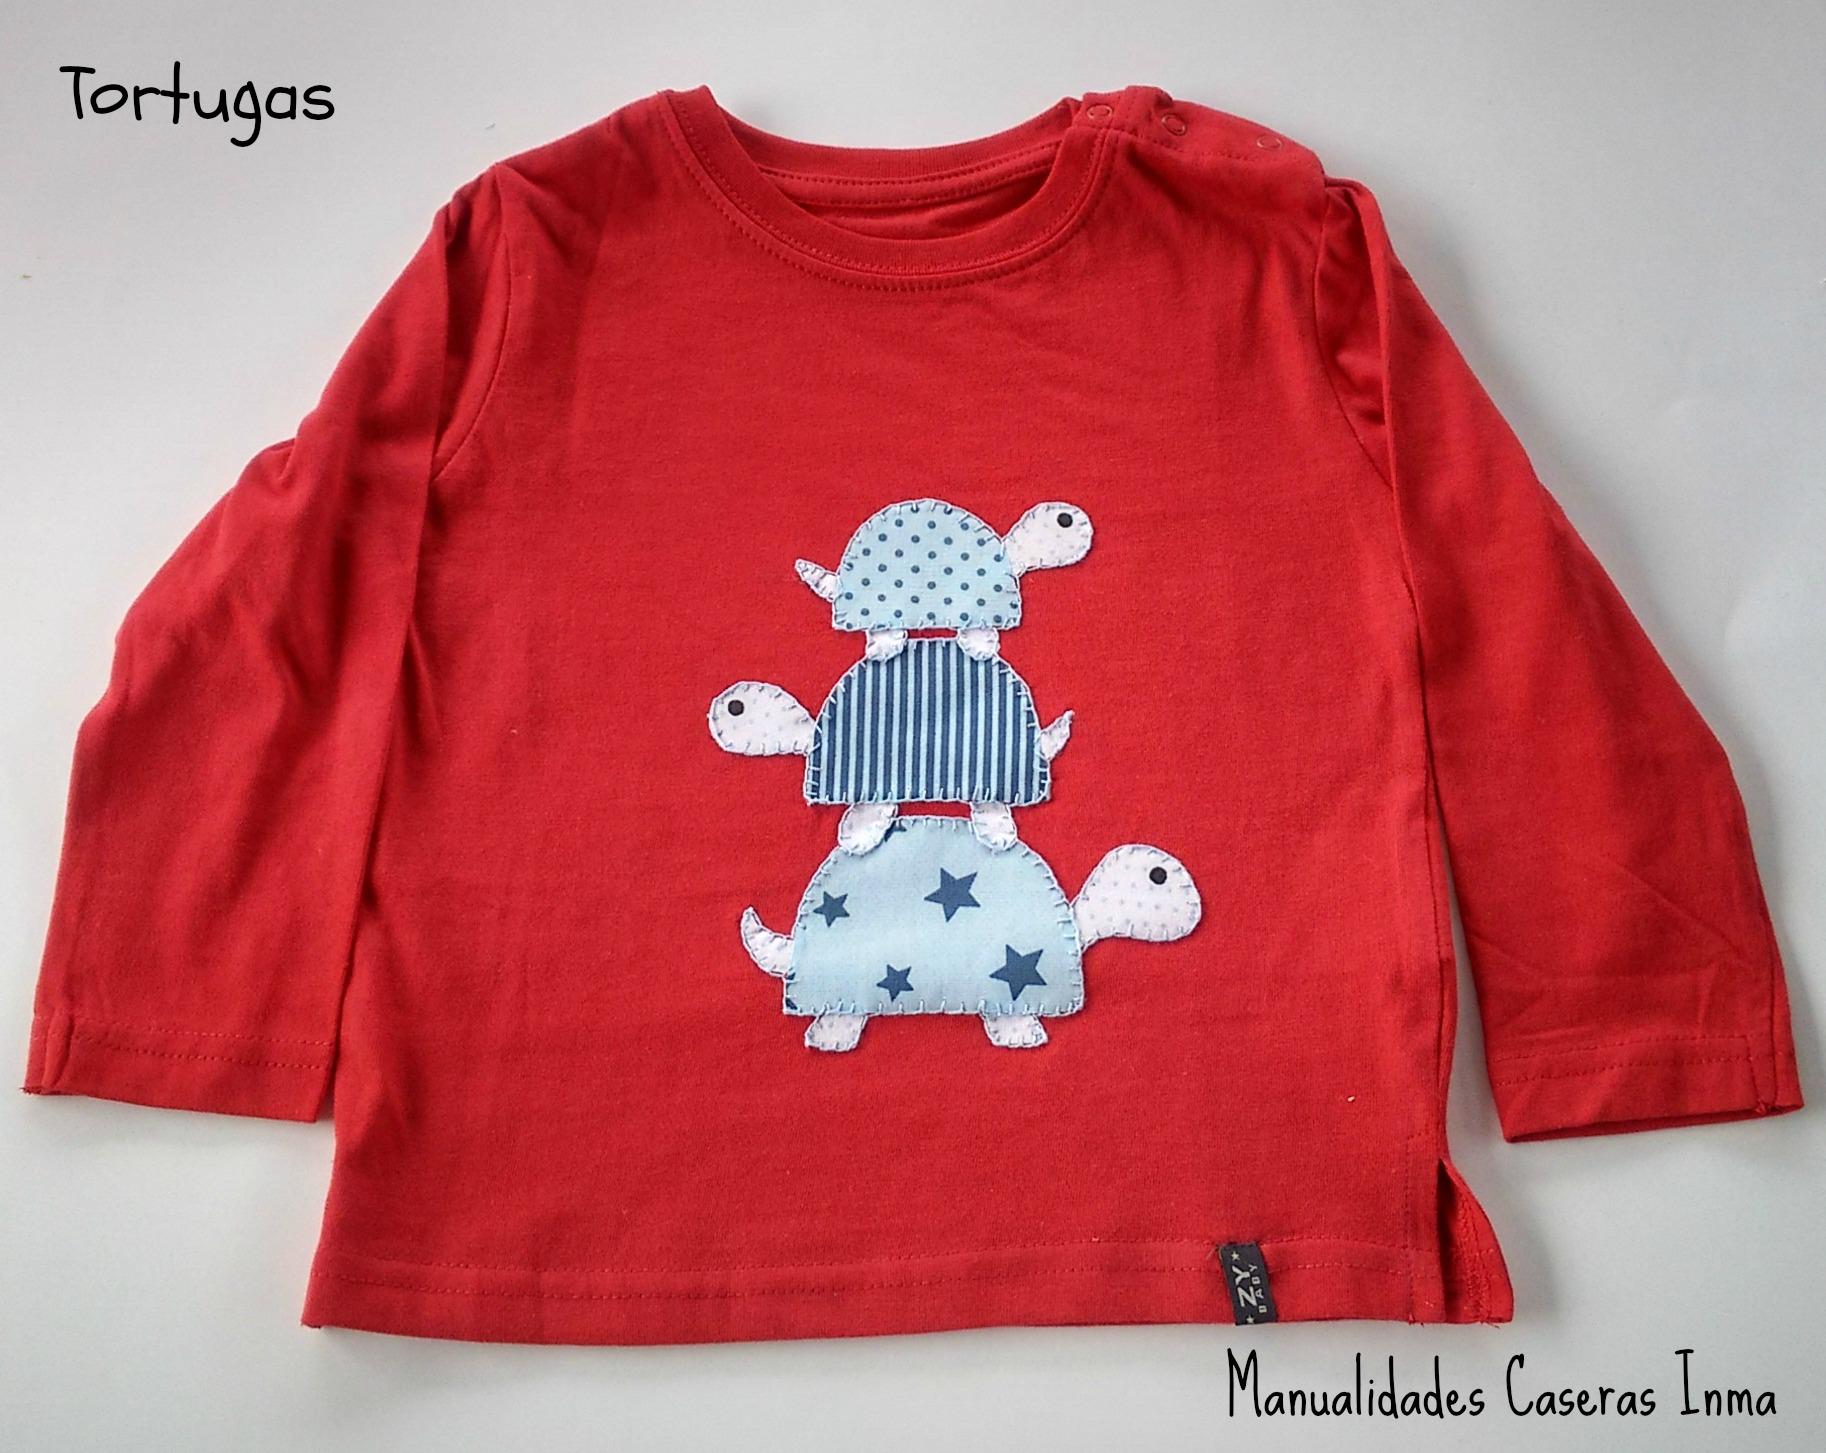 Manualidades Caseras Inma_ camiseta tortugas en tonos azules